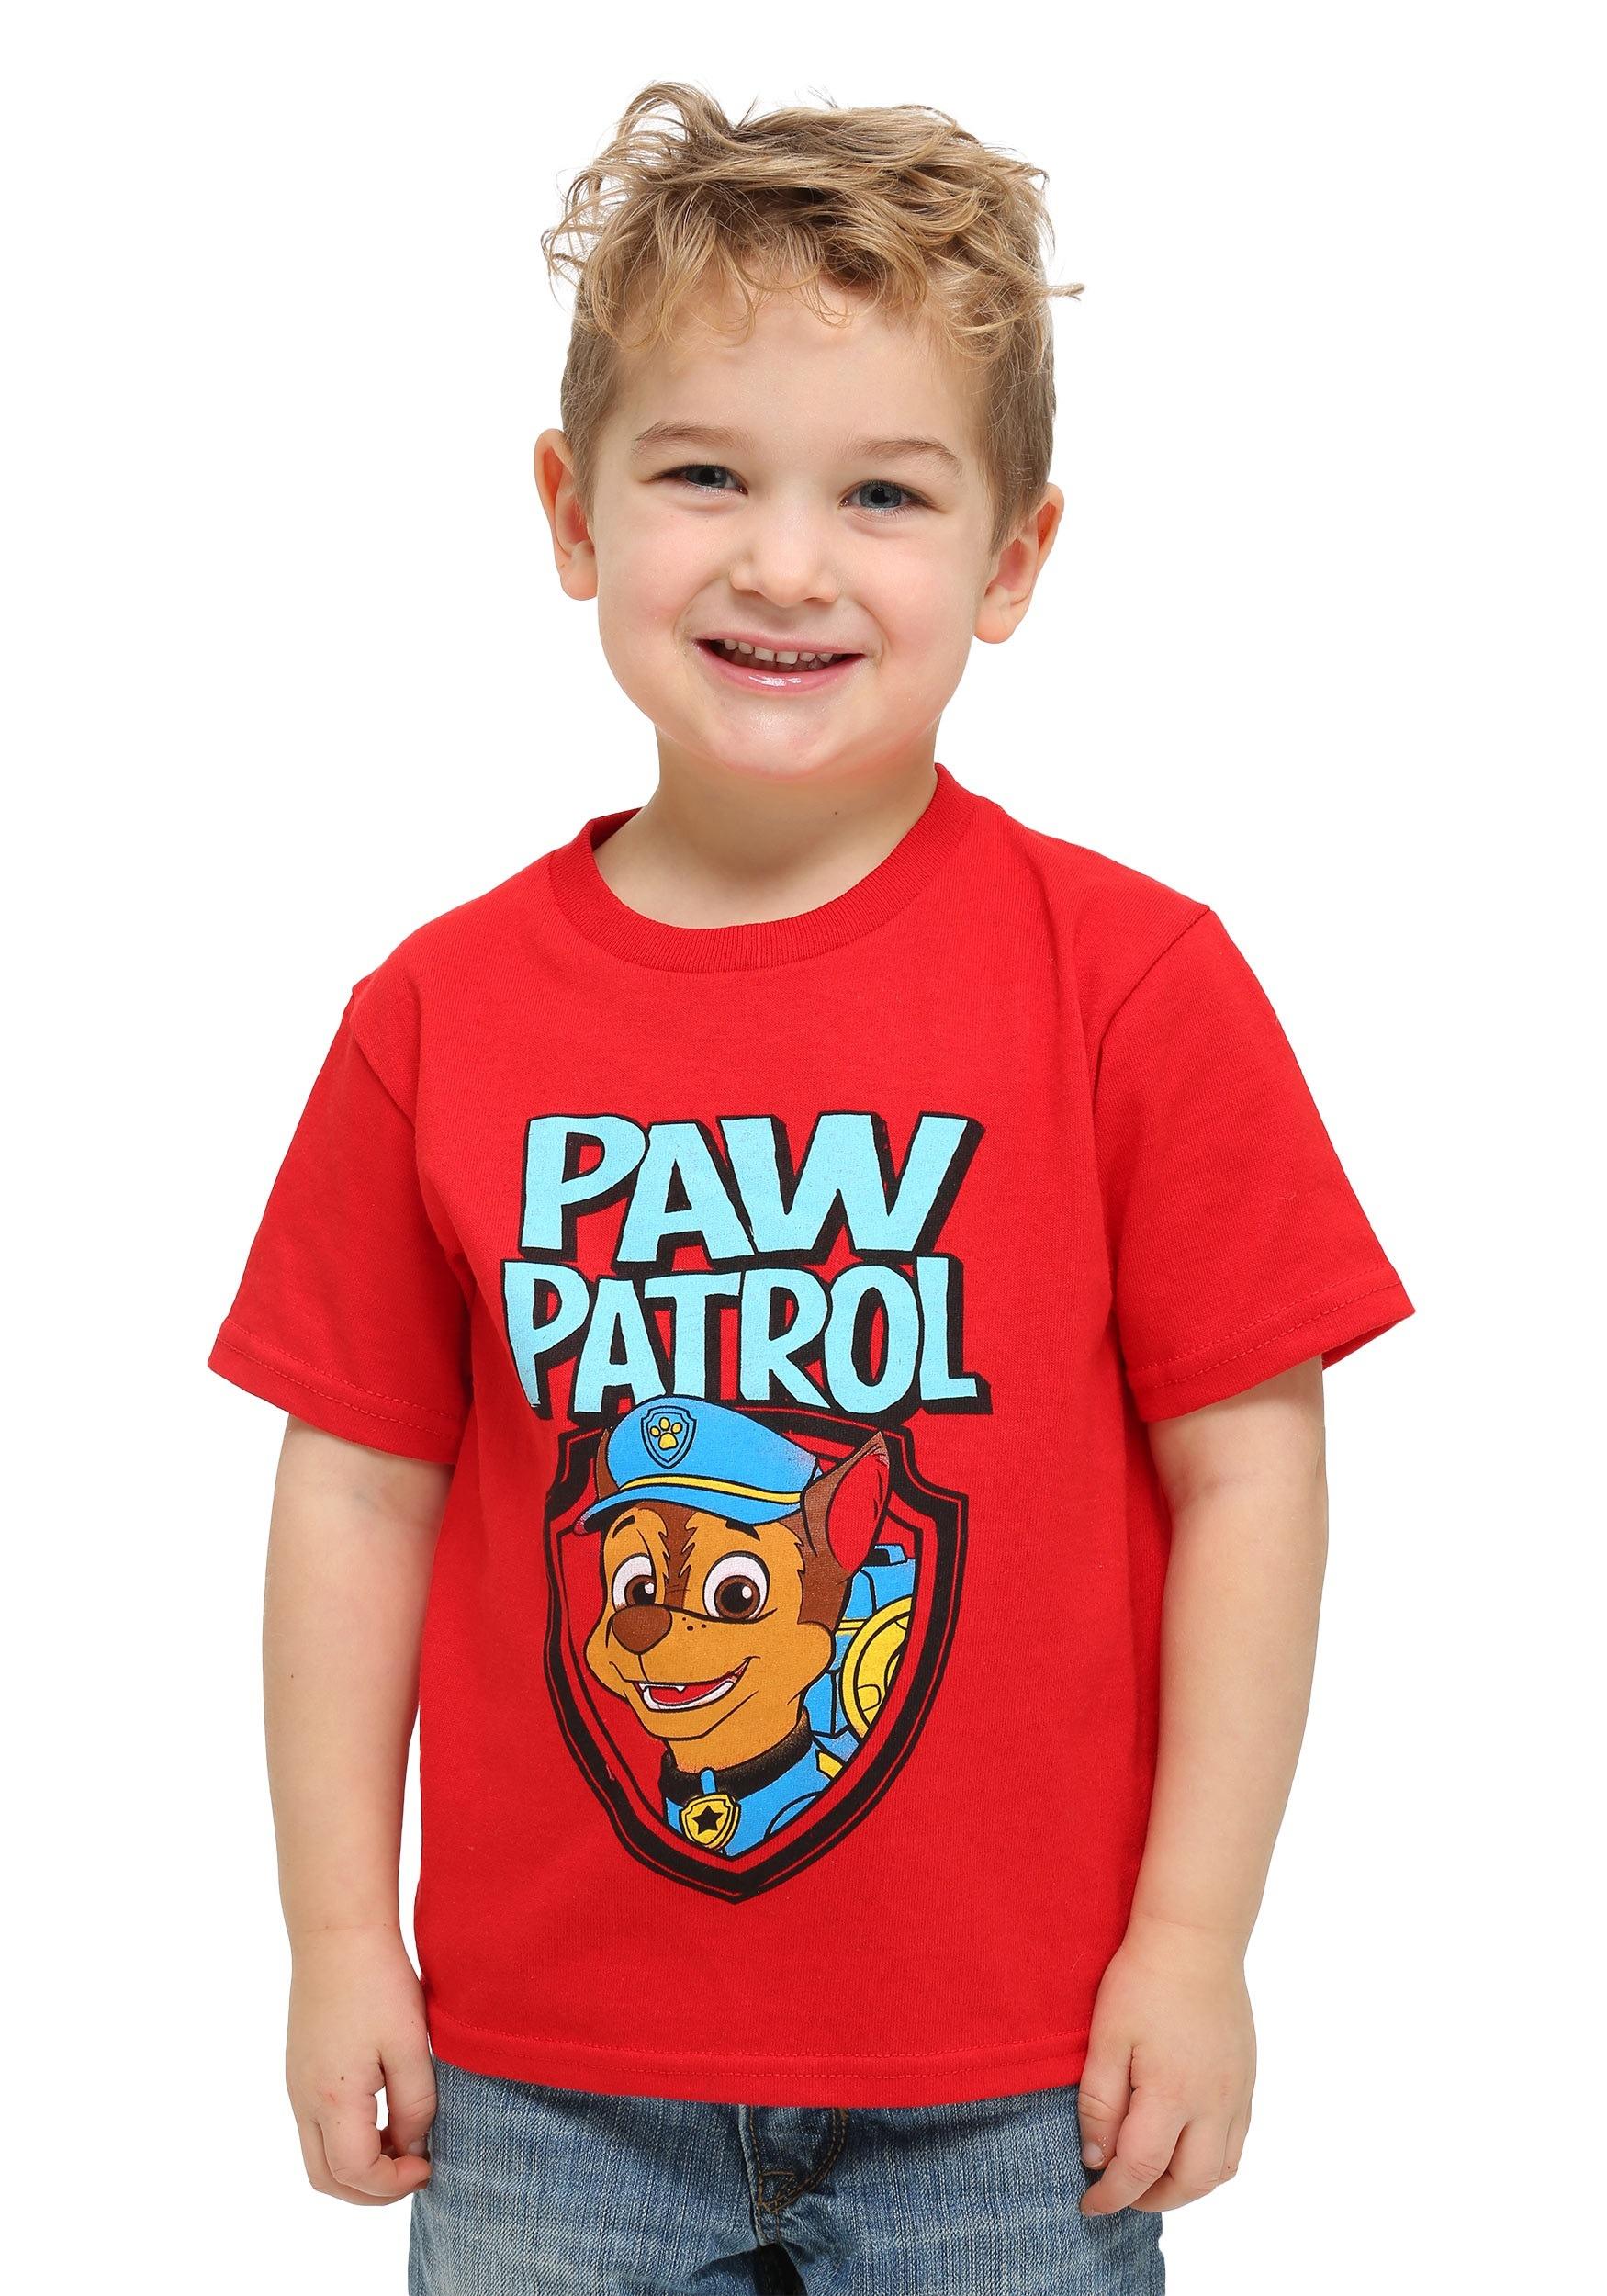 Nickelodeon Toddler Boy Short Sleeve Graphic Tshirt